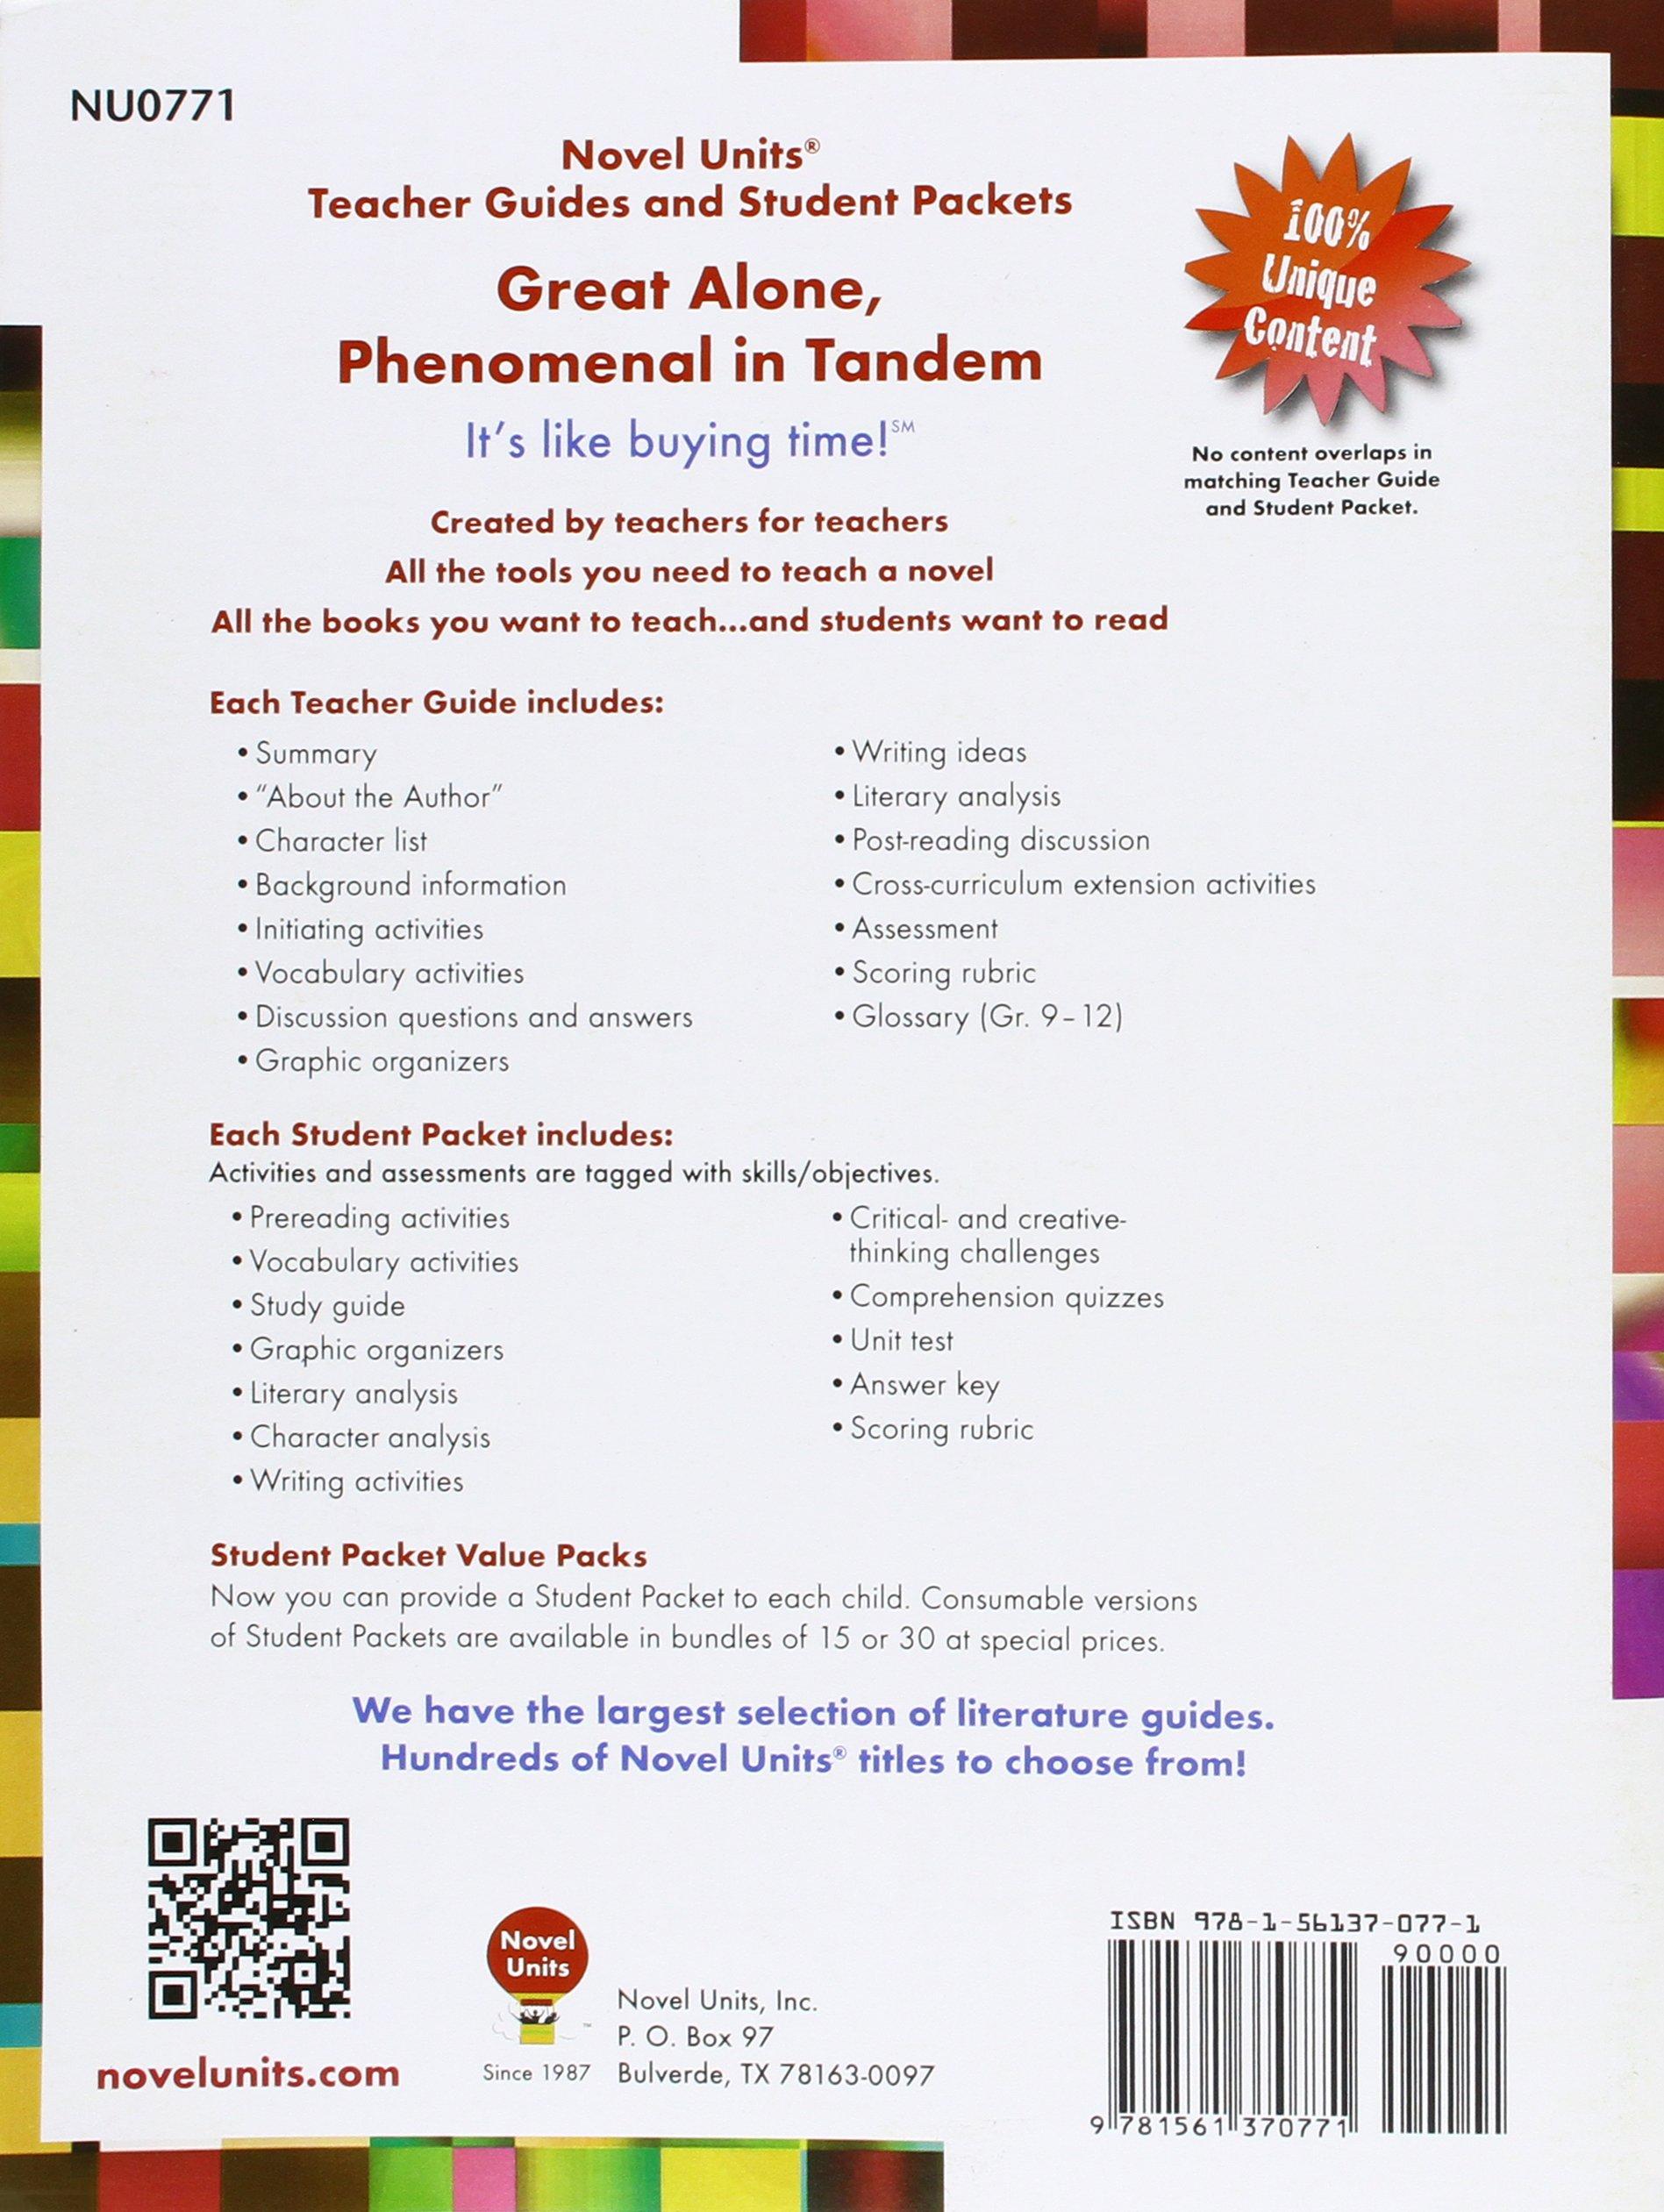 Seedfolks Teacher Guide By Novel Units Novel Units 9781561370771